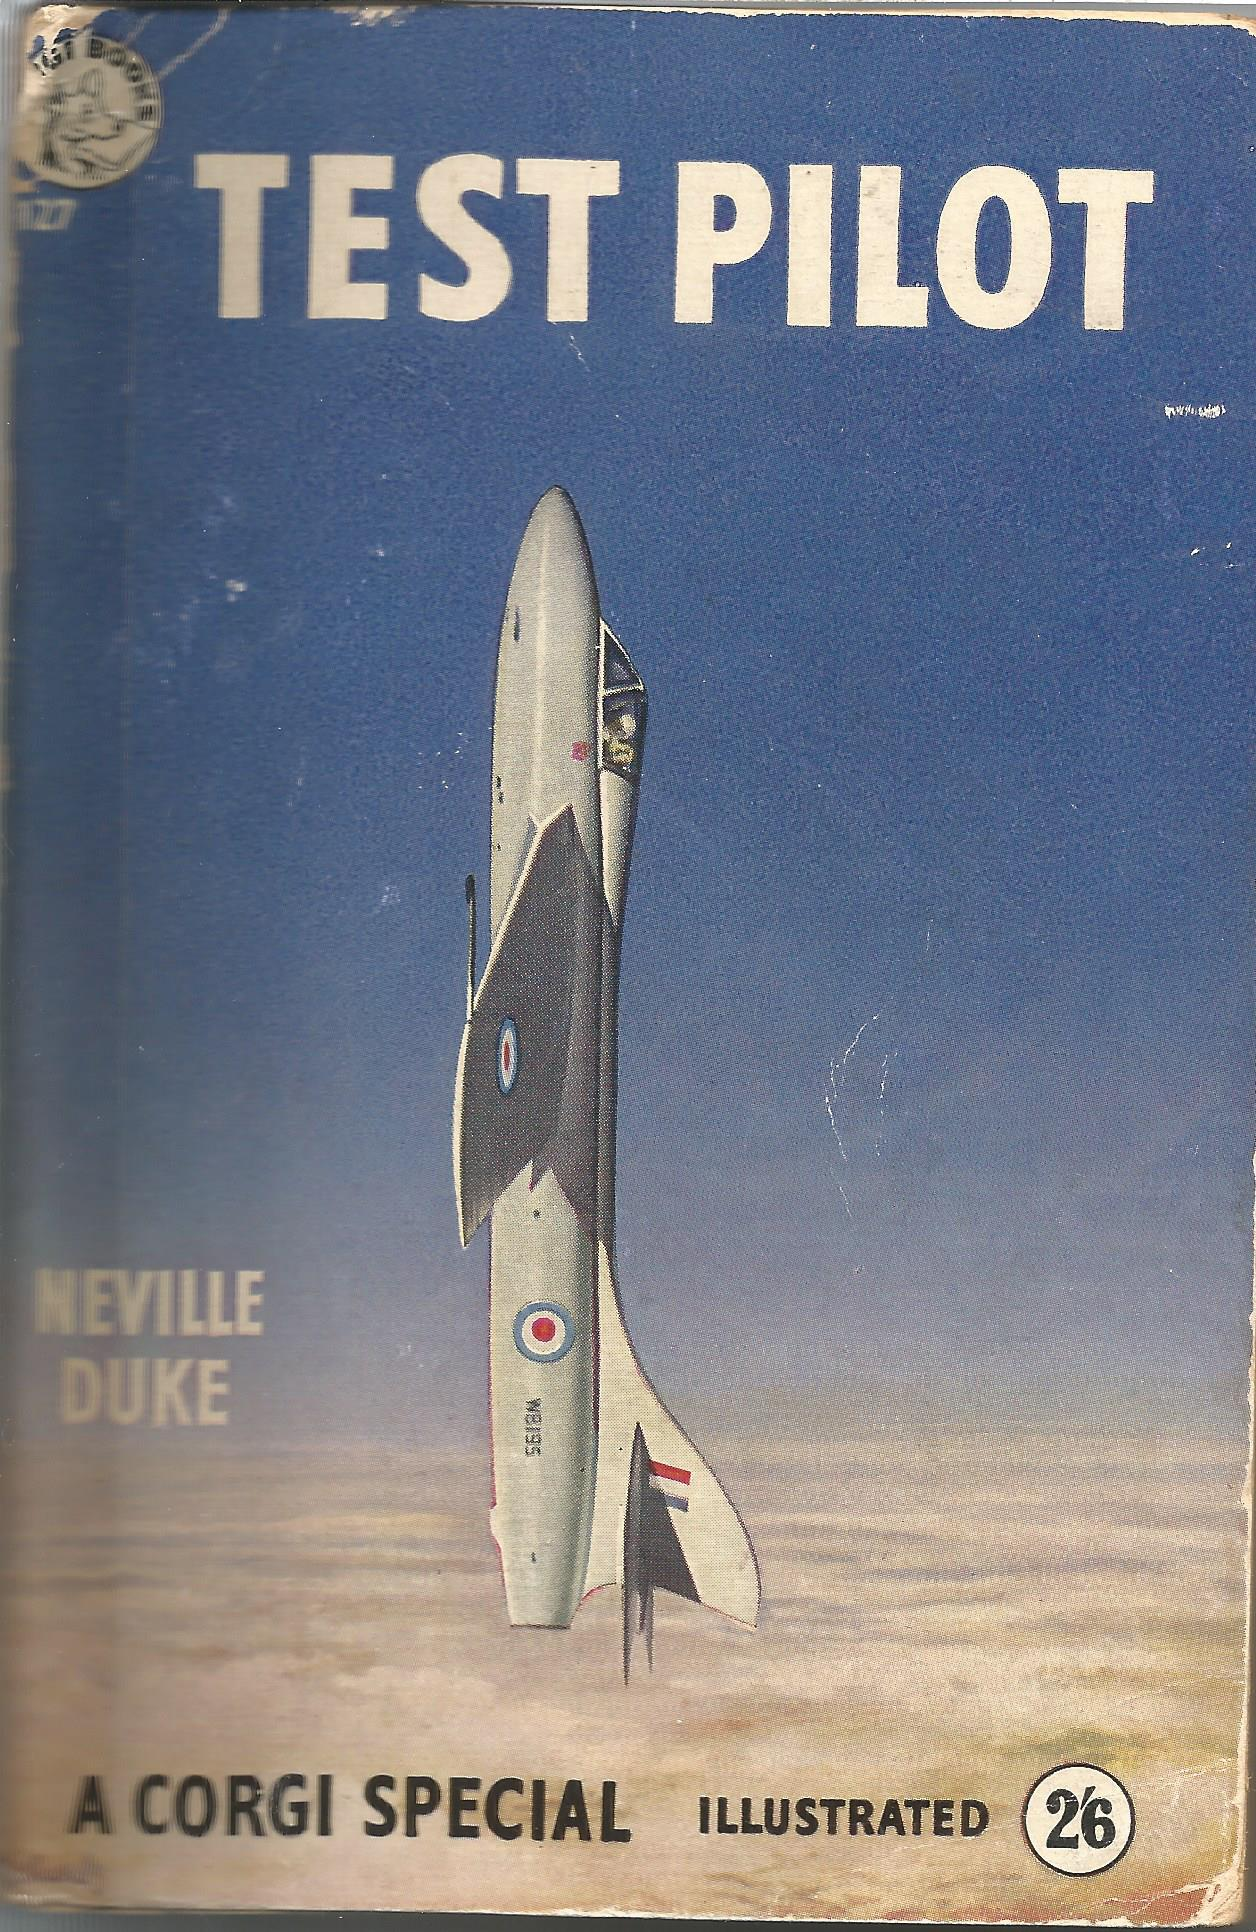 Sqn Ldr Neville Duke DSO DFC signed paperback book Test Pilot; bit beaten uPOdd loose pages signed